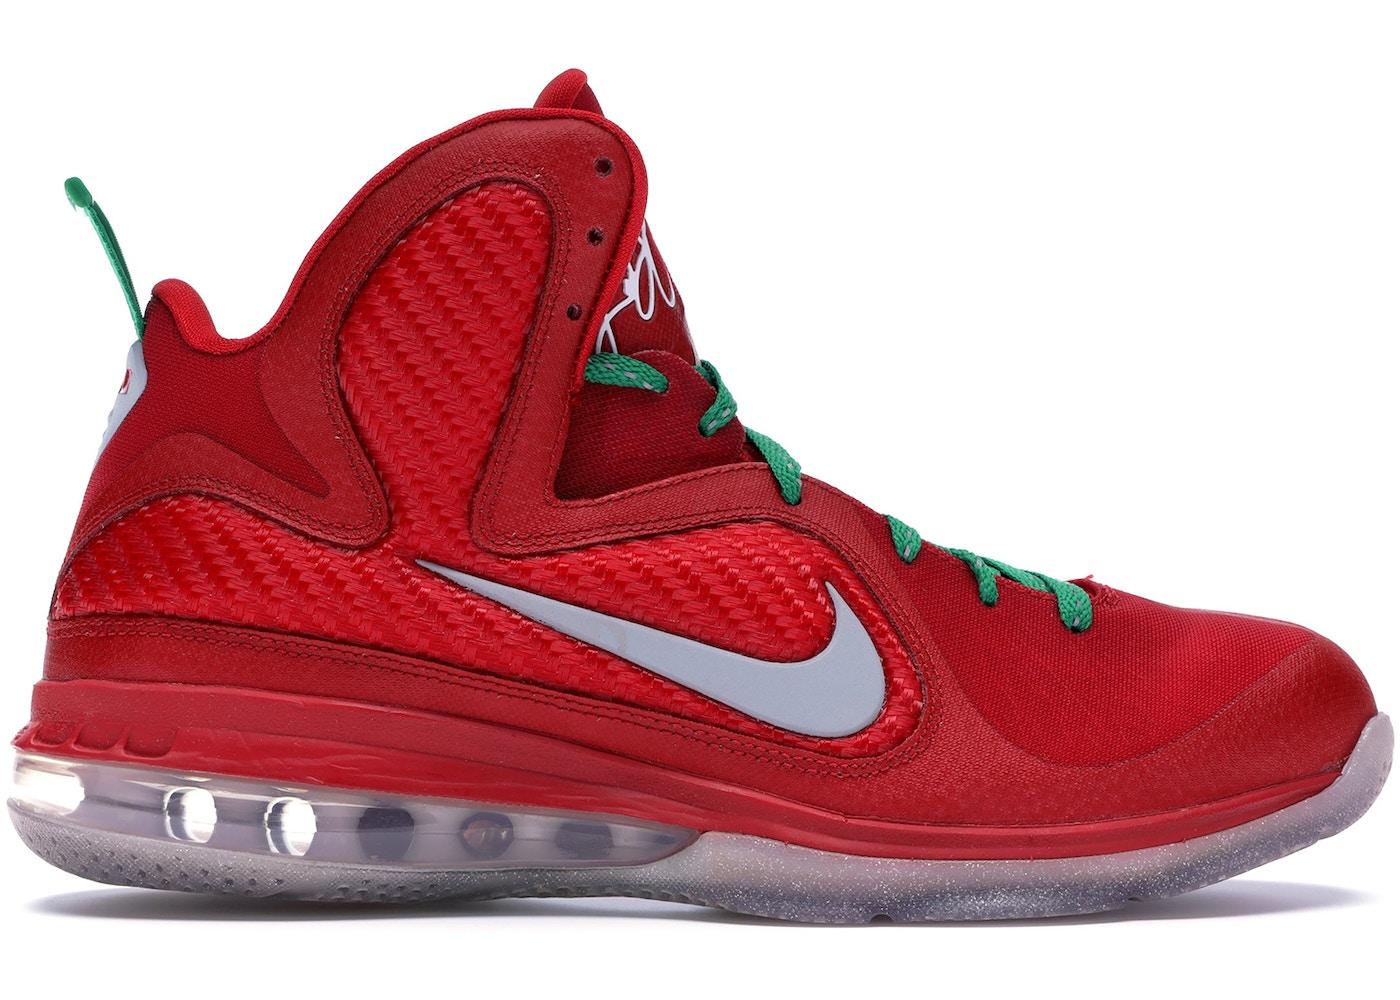 d1265c24f3874 Buy Nike LeBron 9 Shoes   Deadstock Sneakers